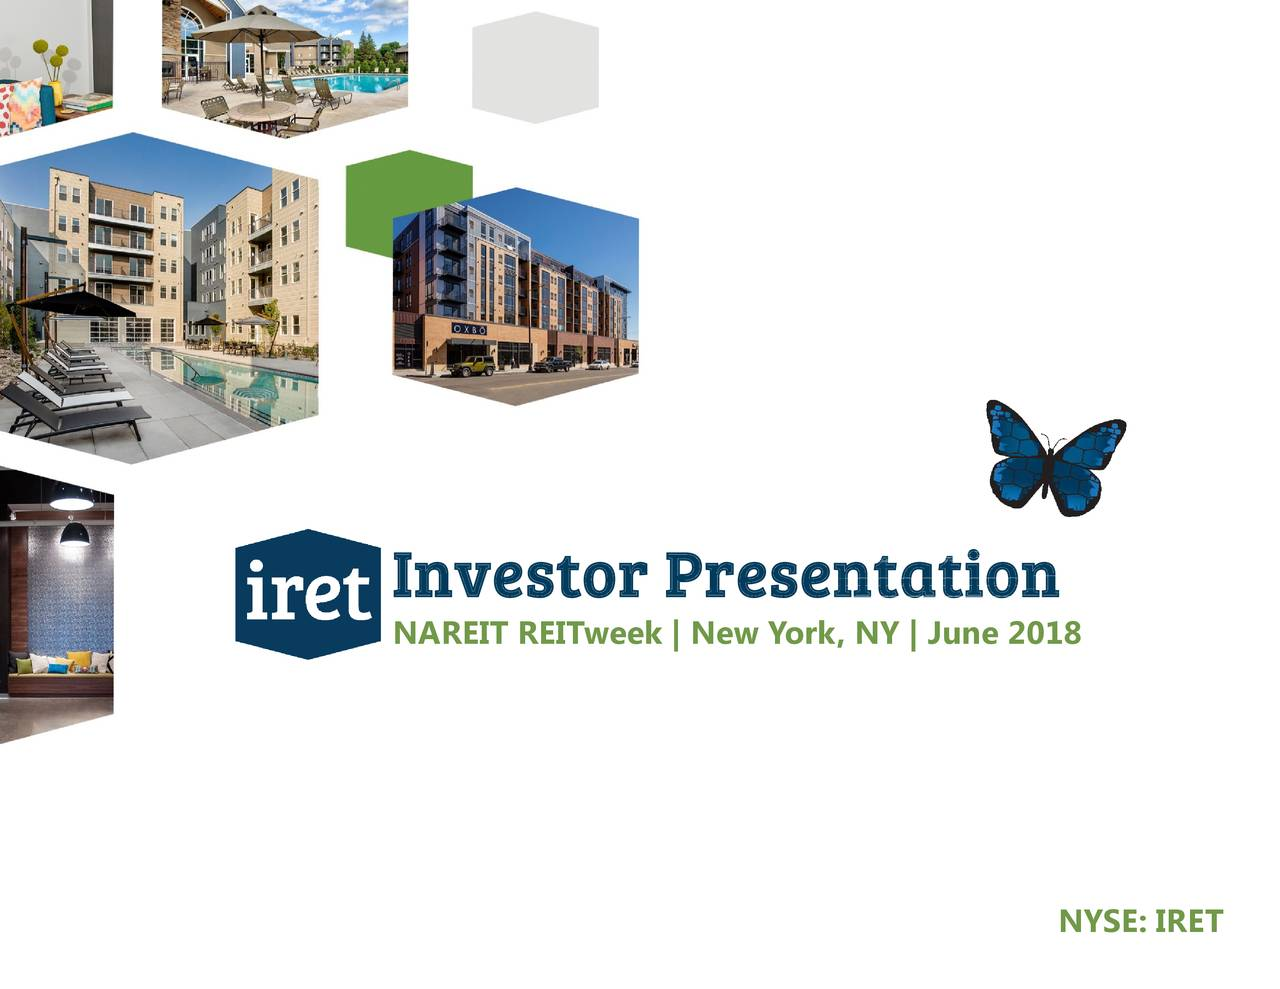 Investors Real Estate Trust (IRET) Presents At NAREIT REITweek